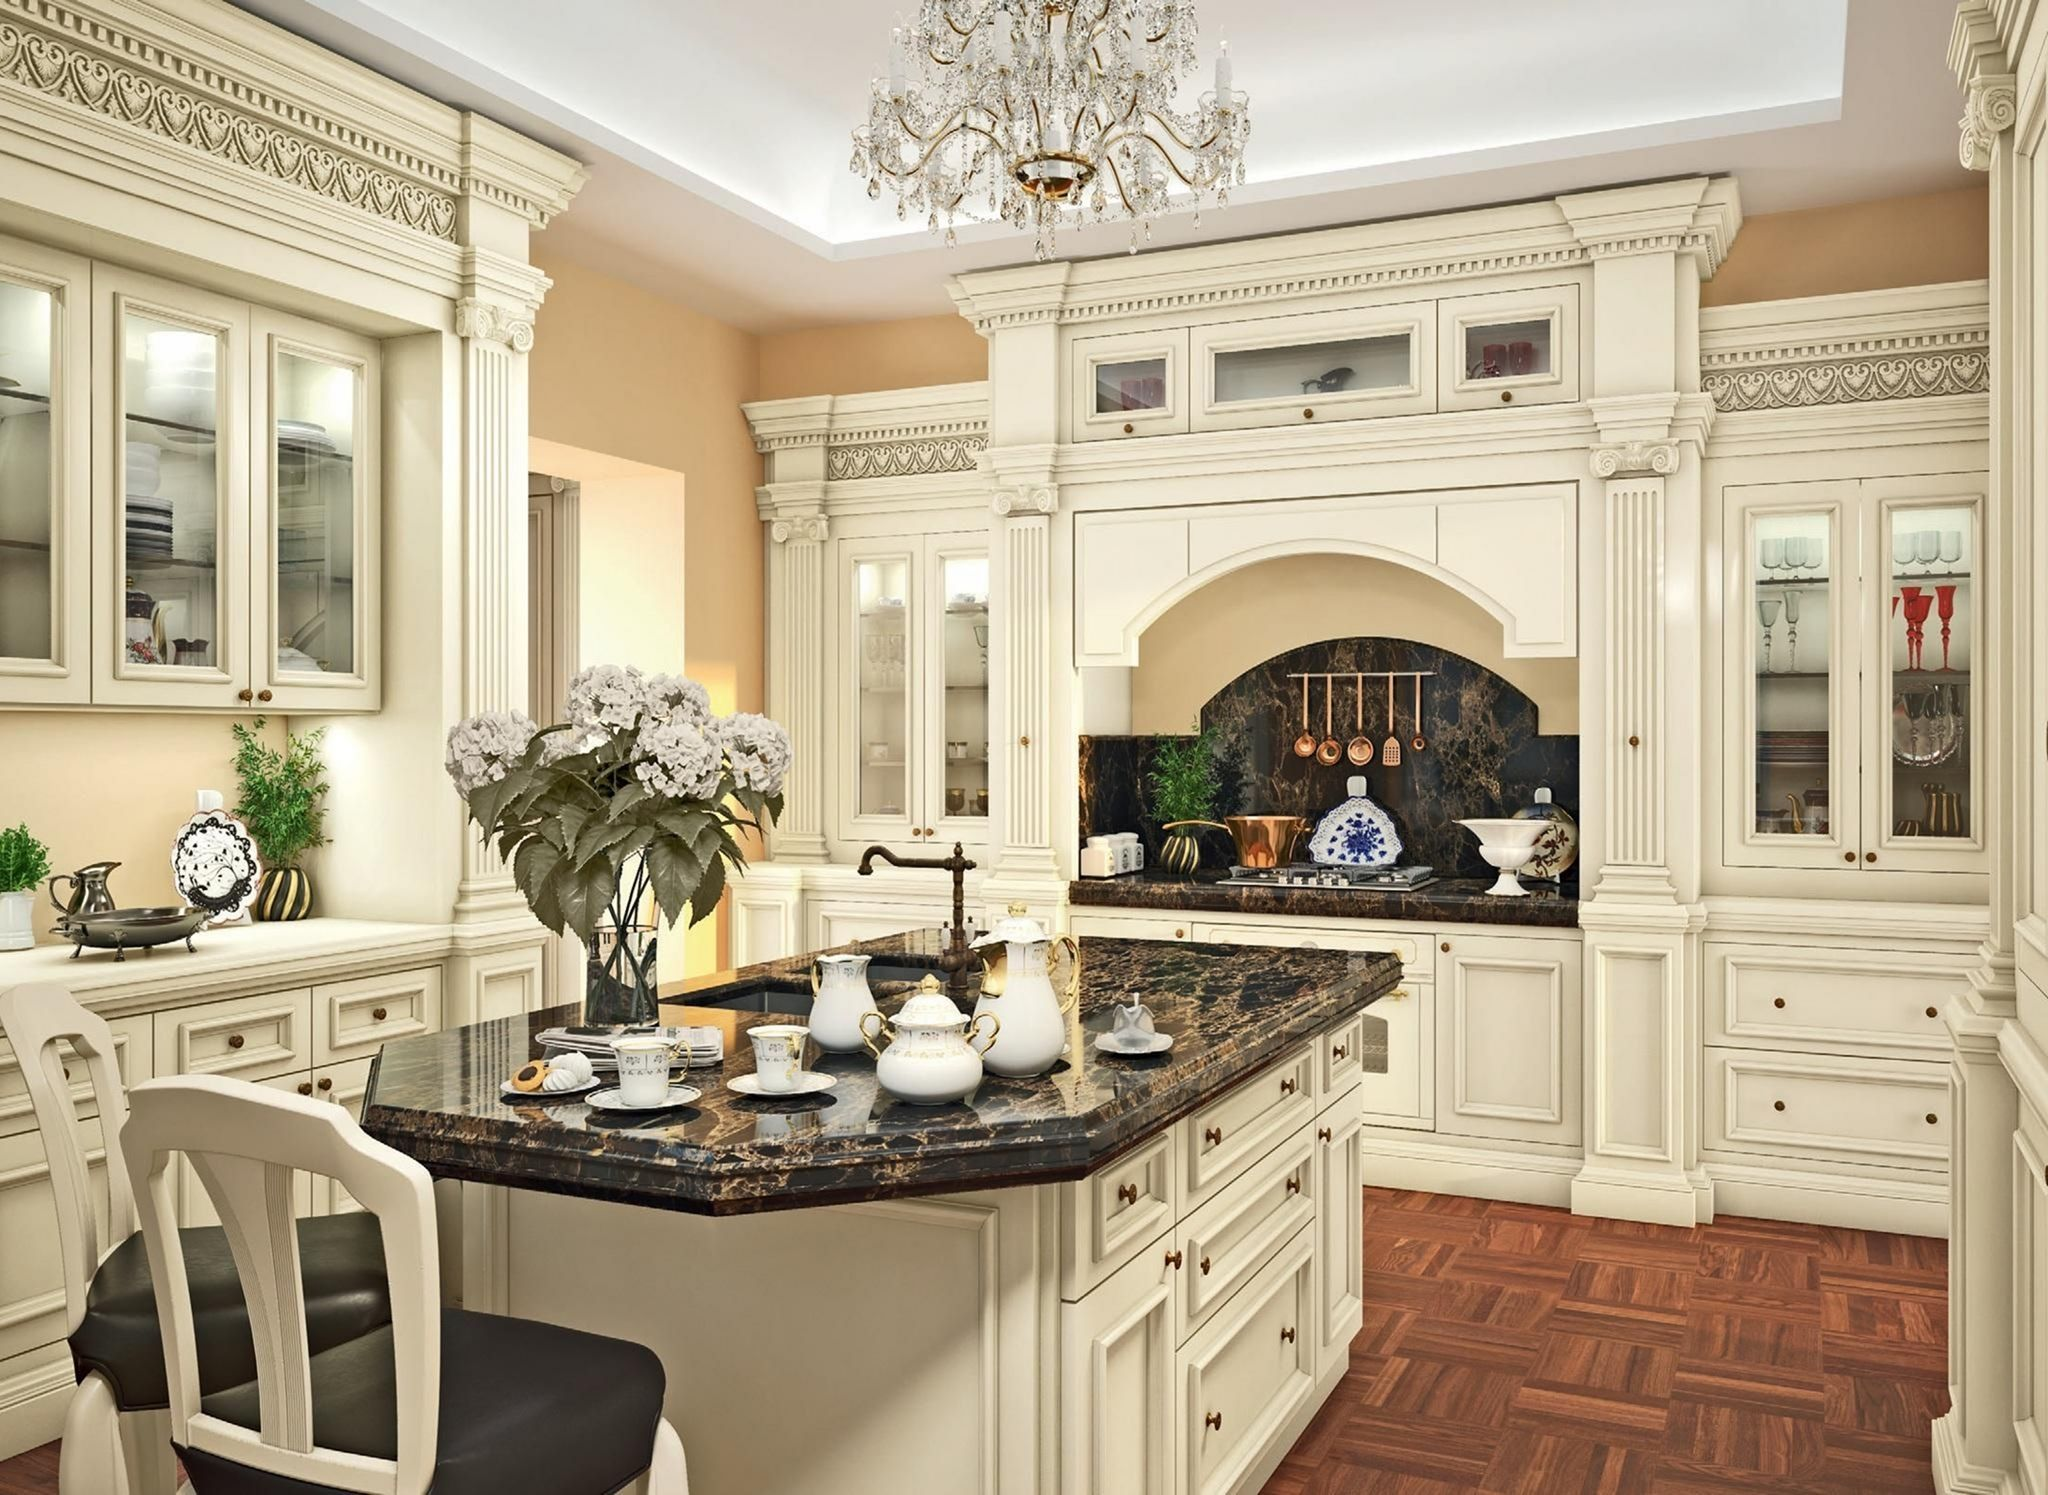 30 Classic Luxurious Kitchen Design Ideas That You Must Know Luxury Kitchens Luxury Kitchen Design Classic Kitchen Design